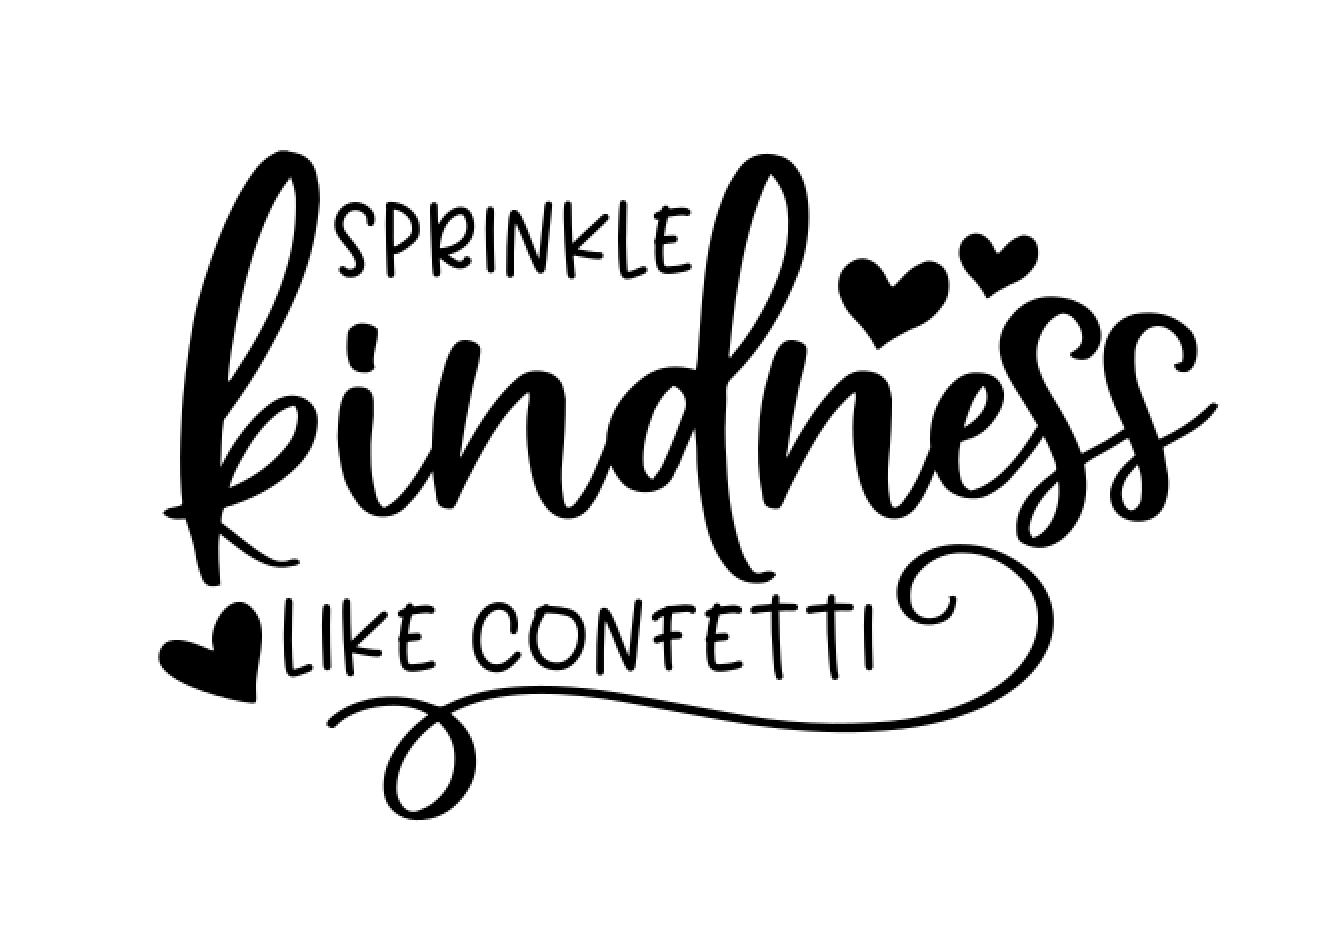 47 Sprinkle kindness like